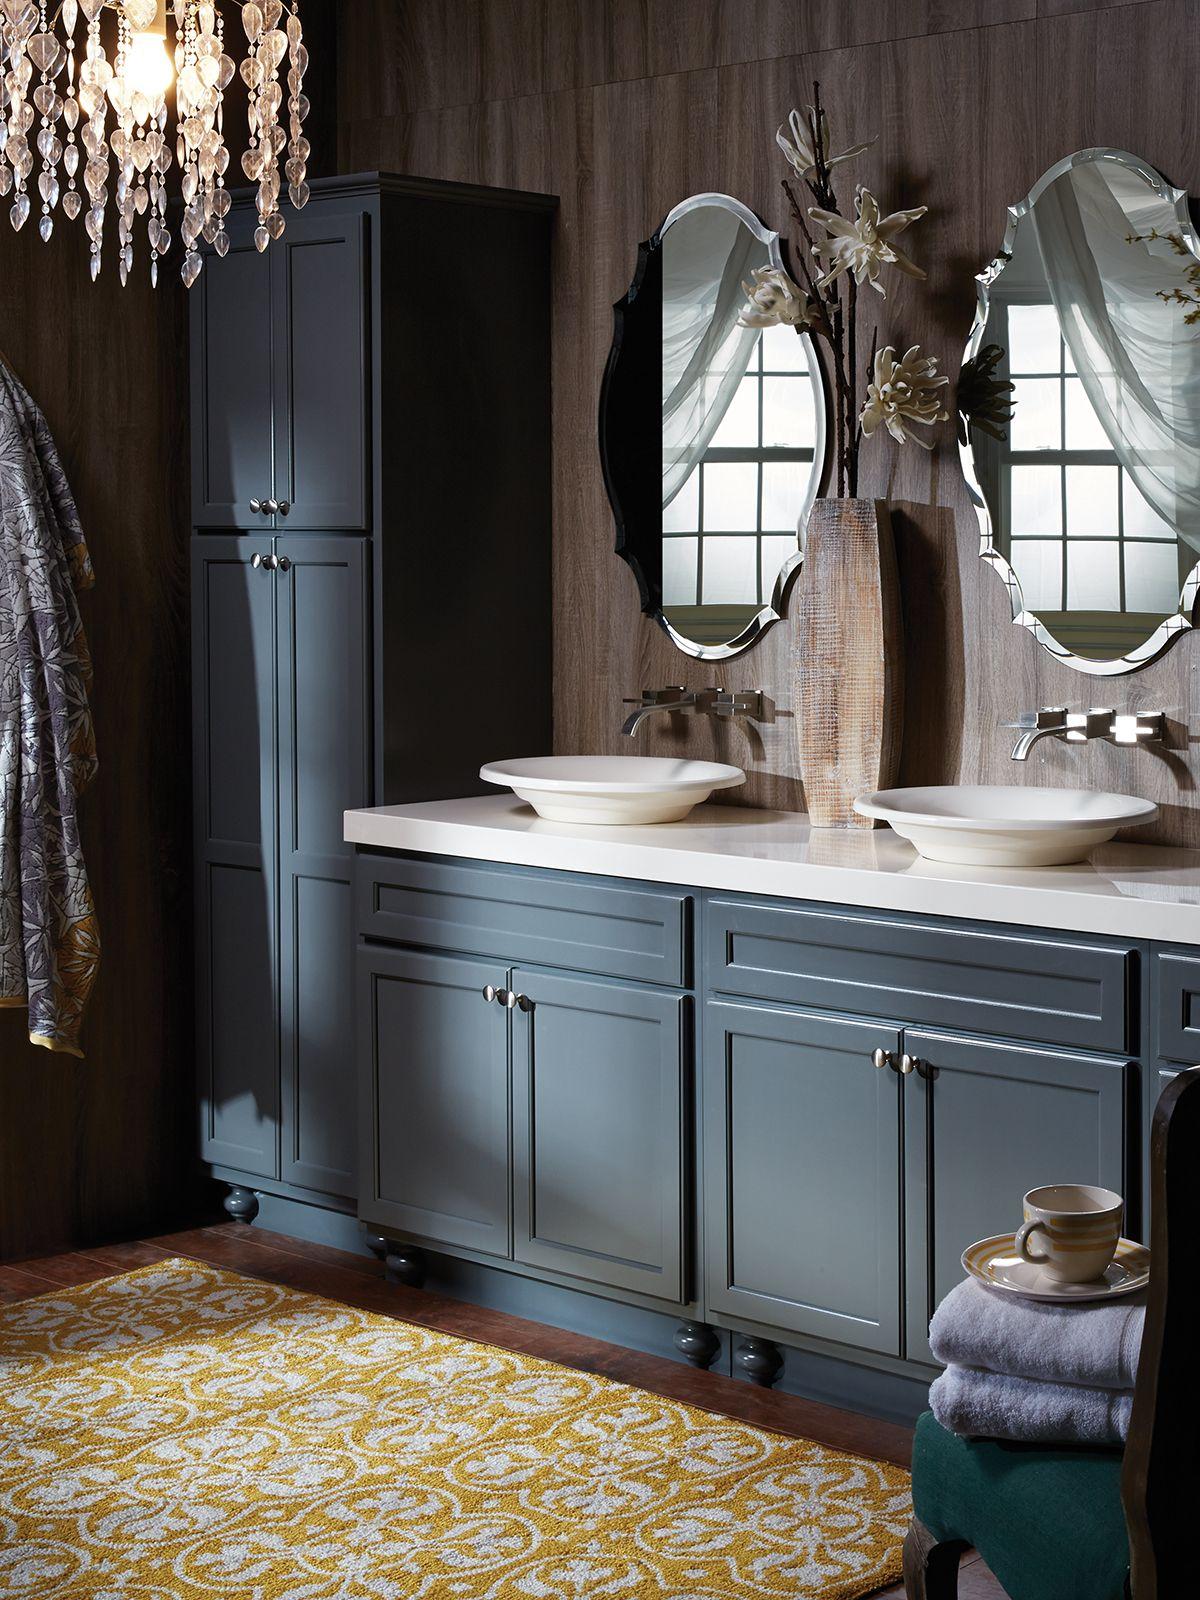 Northbrook Birch Graphite Bertch Bathroom Cabinetry